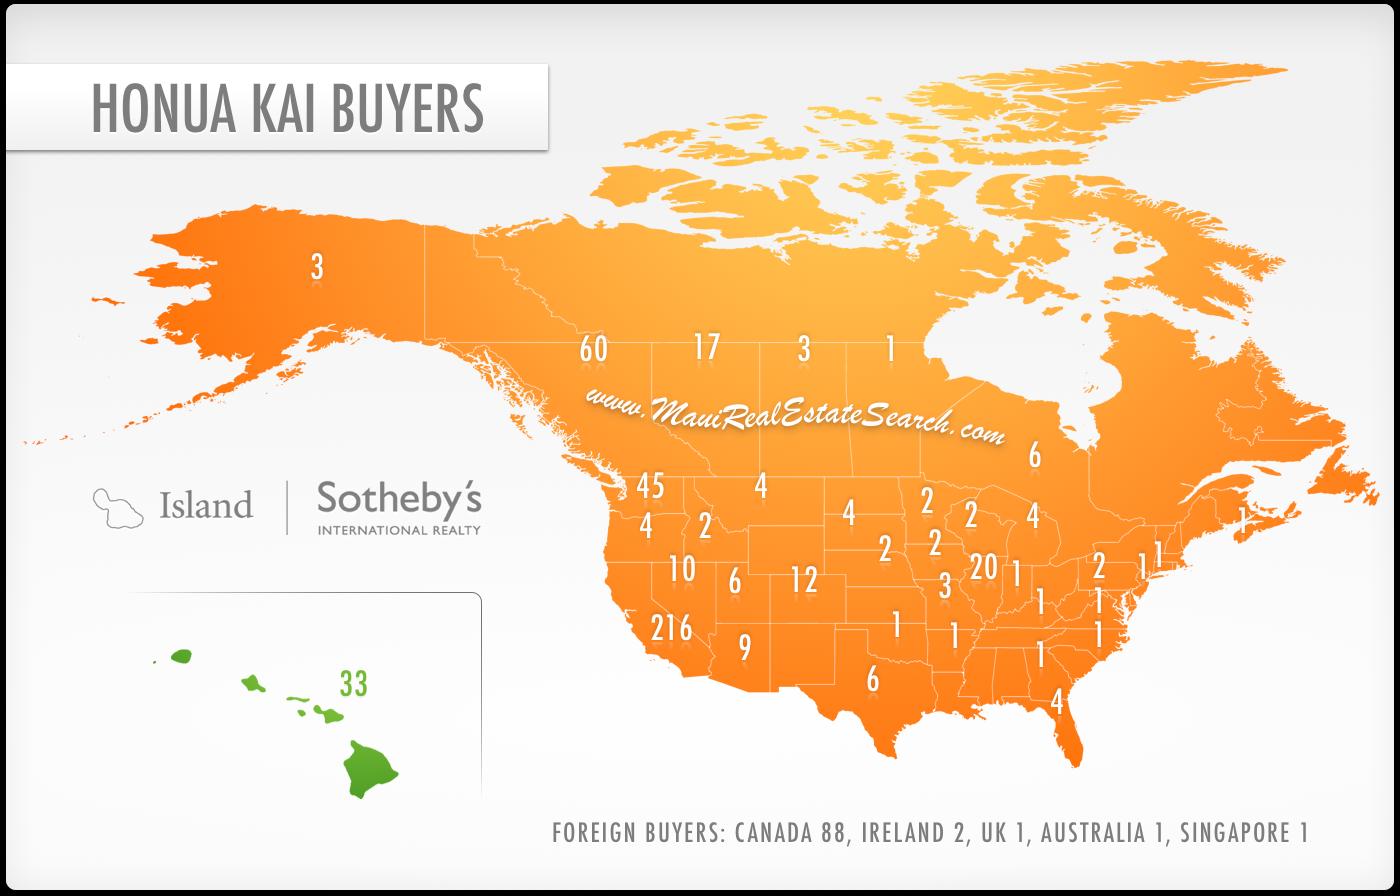 honua kai buyers map